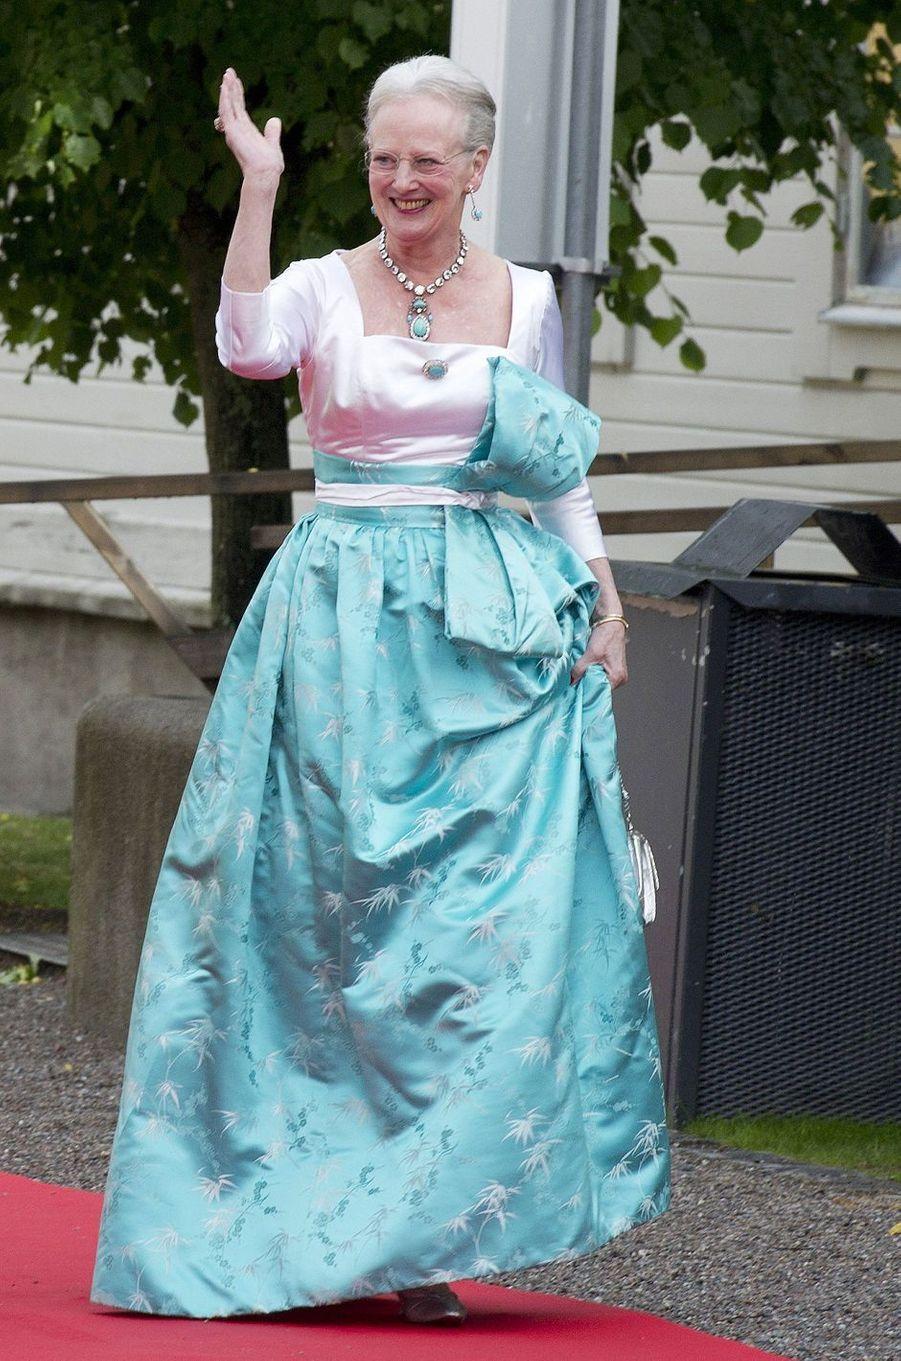 La reine Margrethe II de Danemark au mariage de la princesse Victoria de Suède, le 18 juin 2010